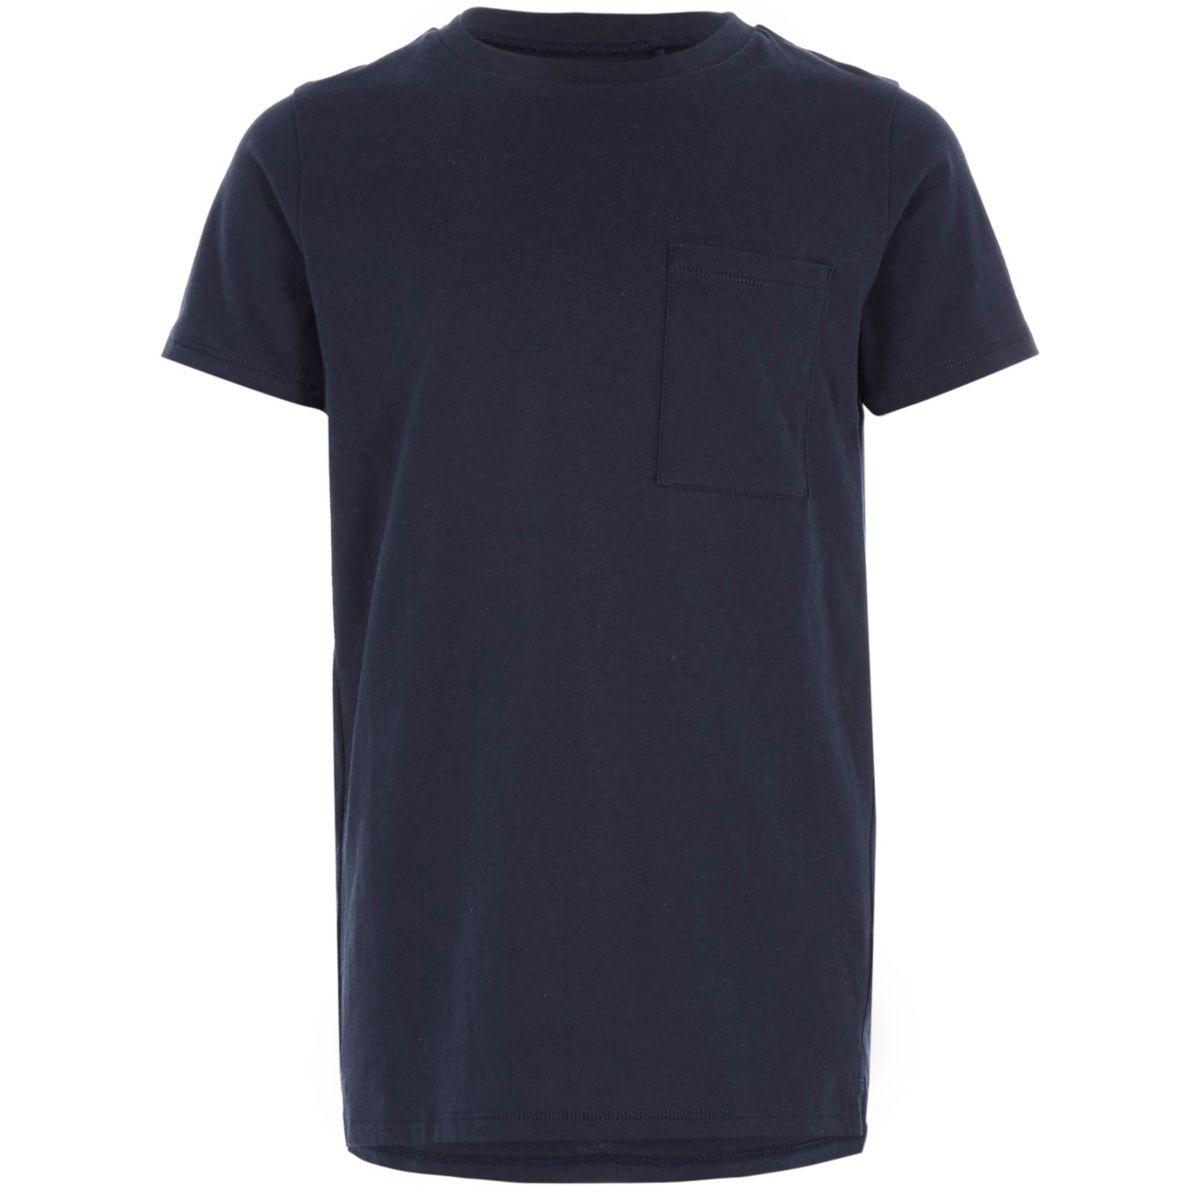 Boys navy pocket t shirt t shirts t shirts vests boys for Boys pocket t shirt